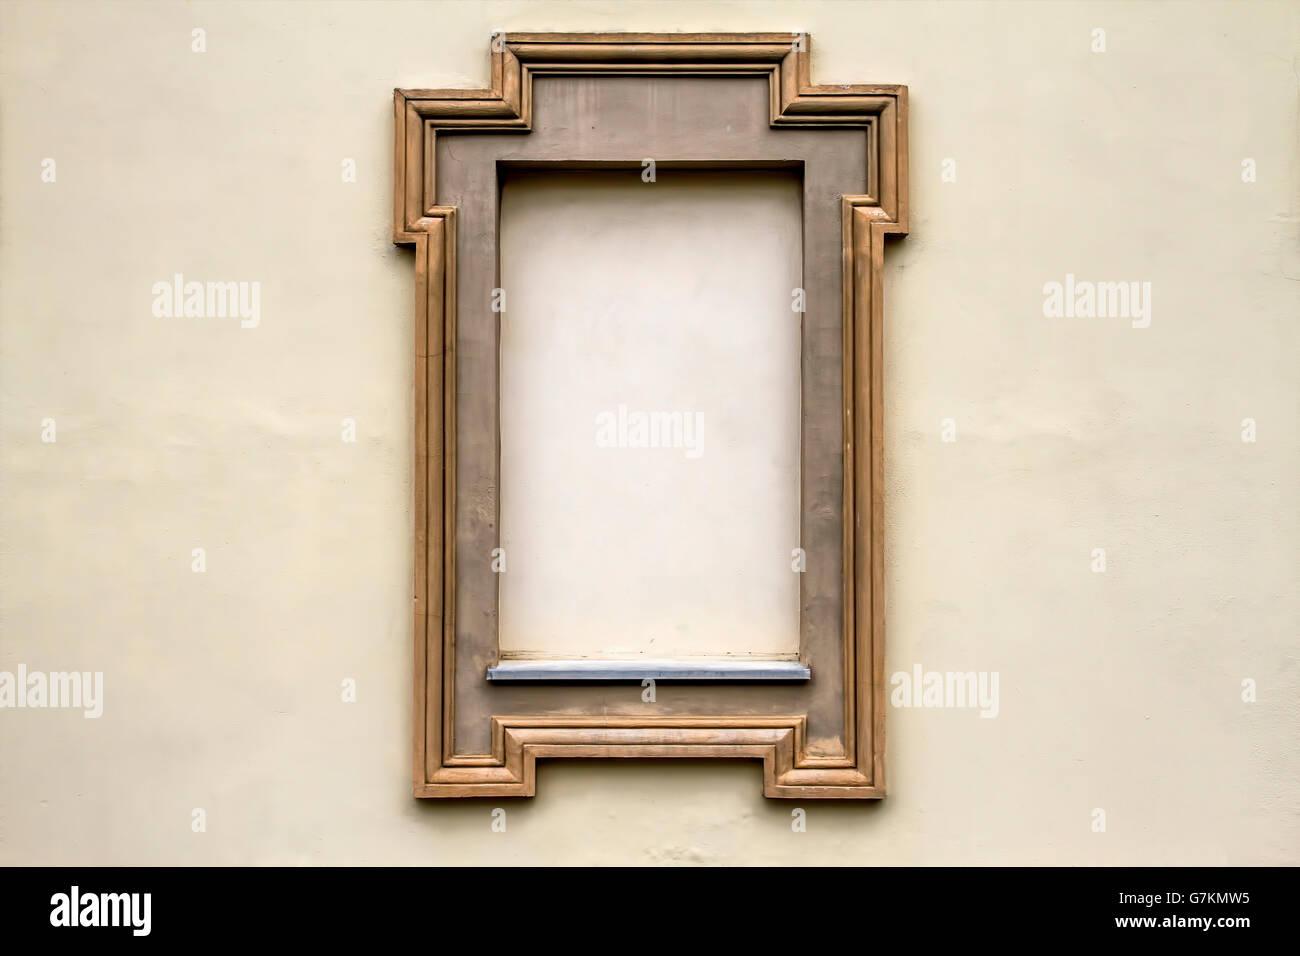 Empty Frames Wall Stockfotos & Empty Frames Wall Bilder - Alamy